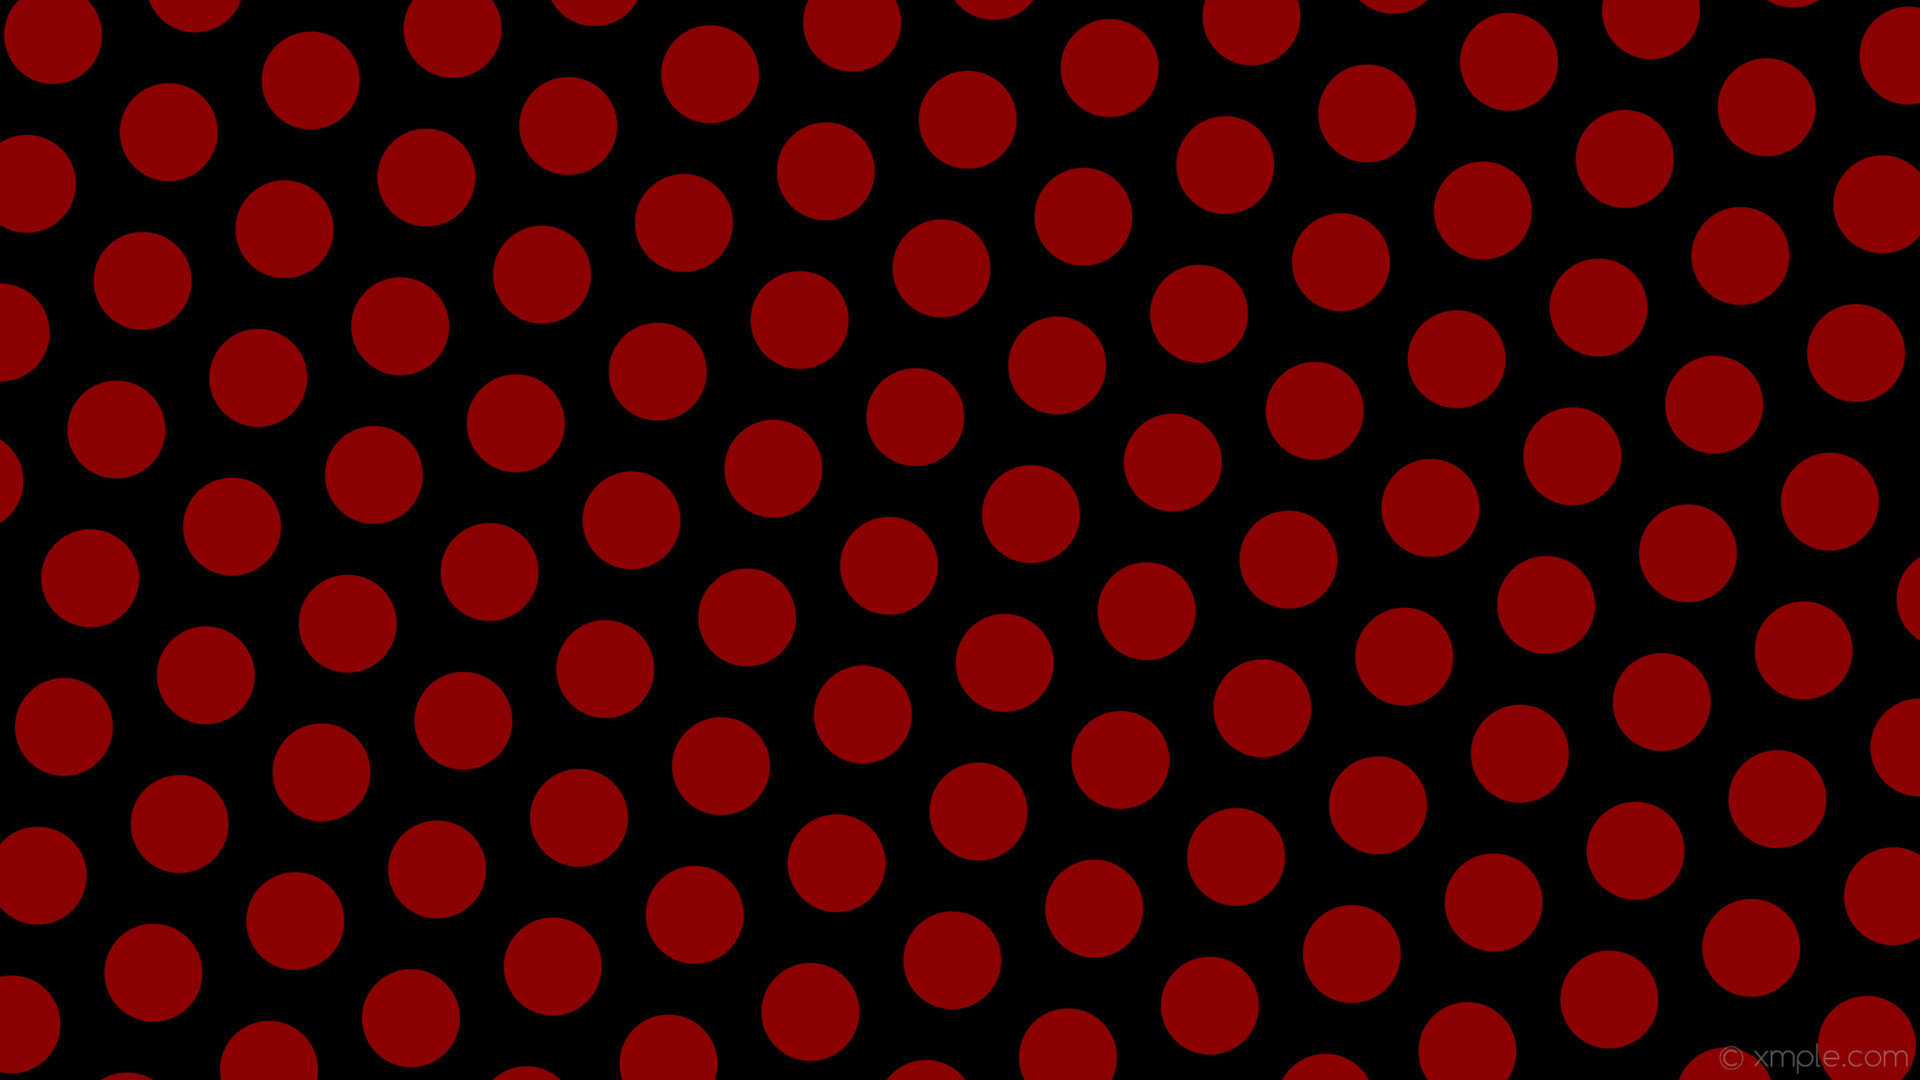 wallpaper hexagon black dots red polka dark red #000000 #8b0000 diagonal  20° 98px